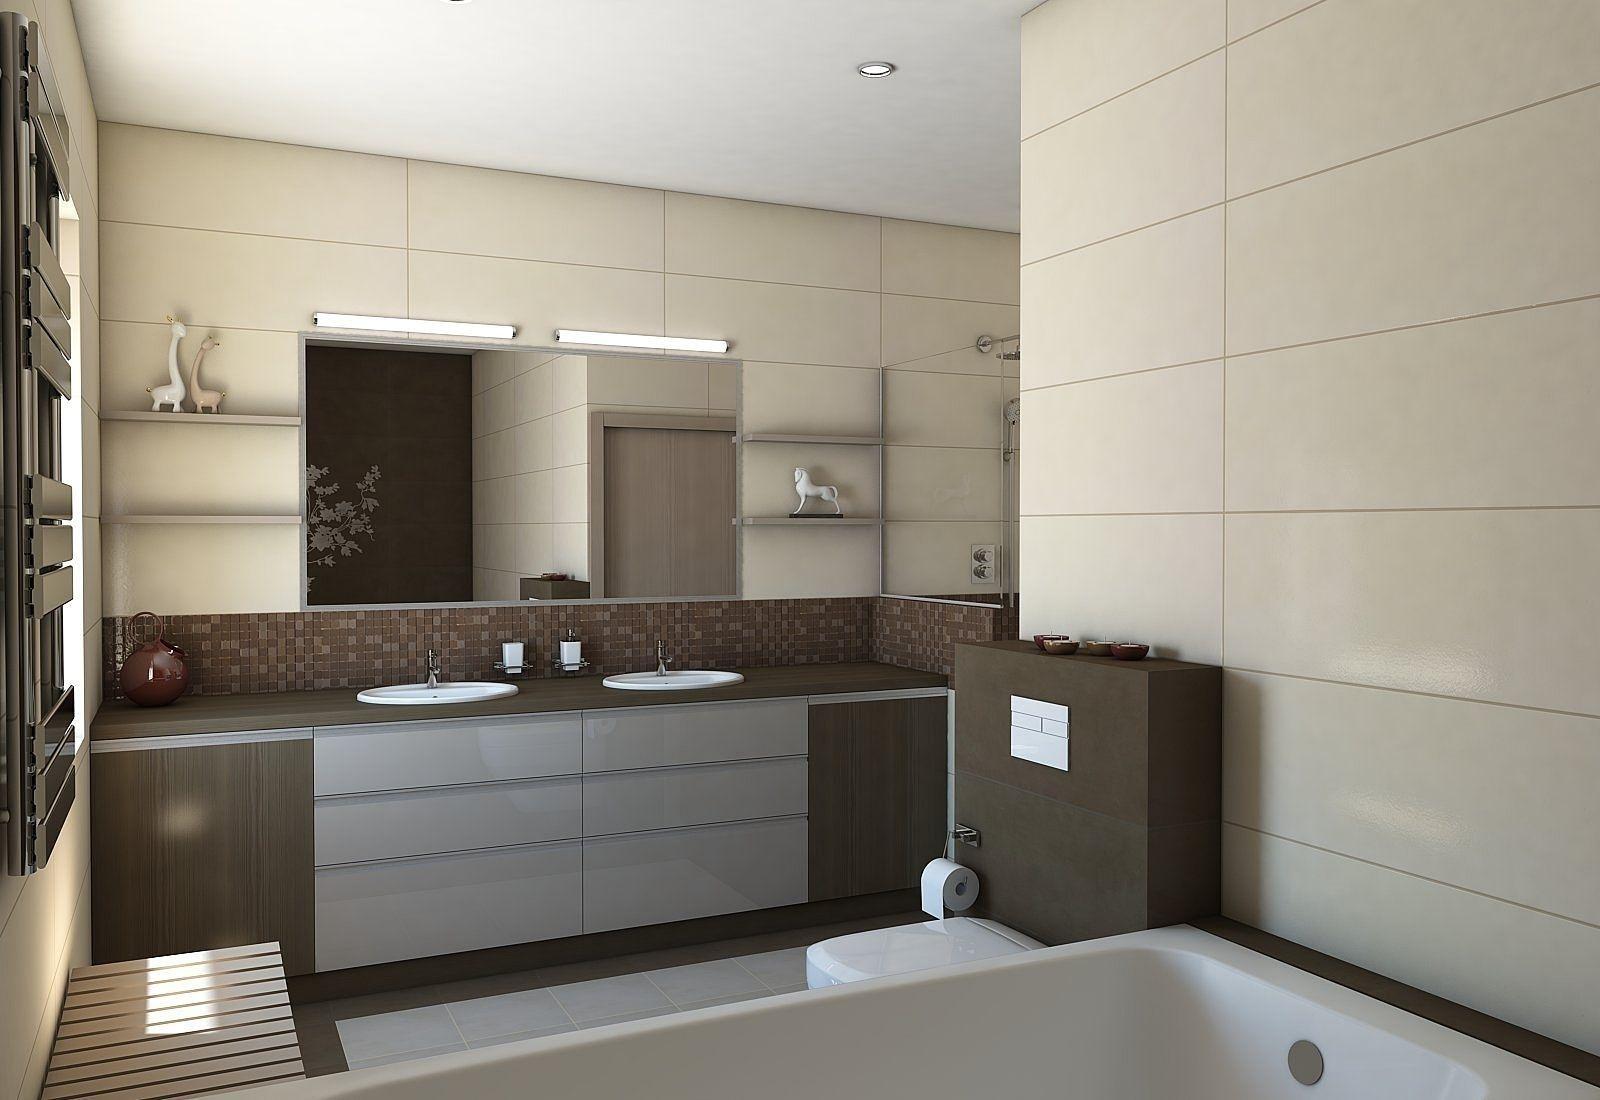 Nice Bathroom With Sauna 3d Model Max Obj 3ds Fbx Skp 1